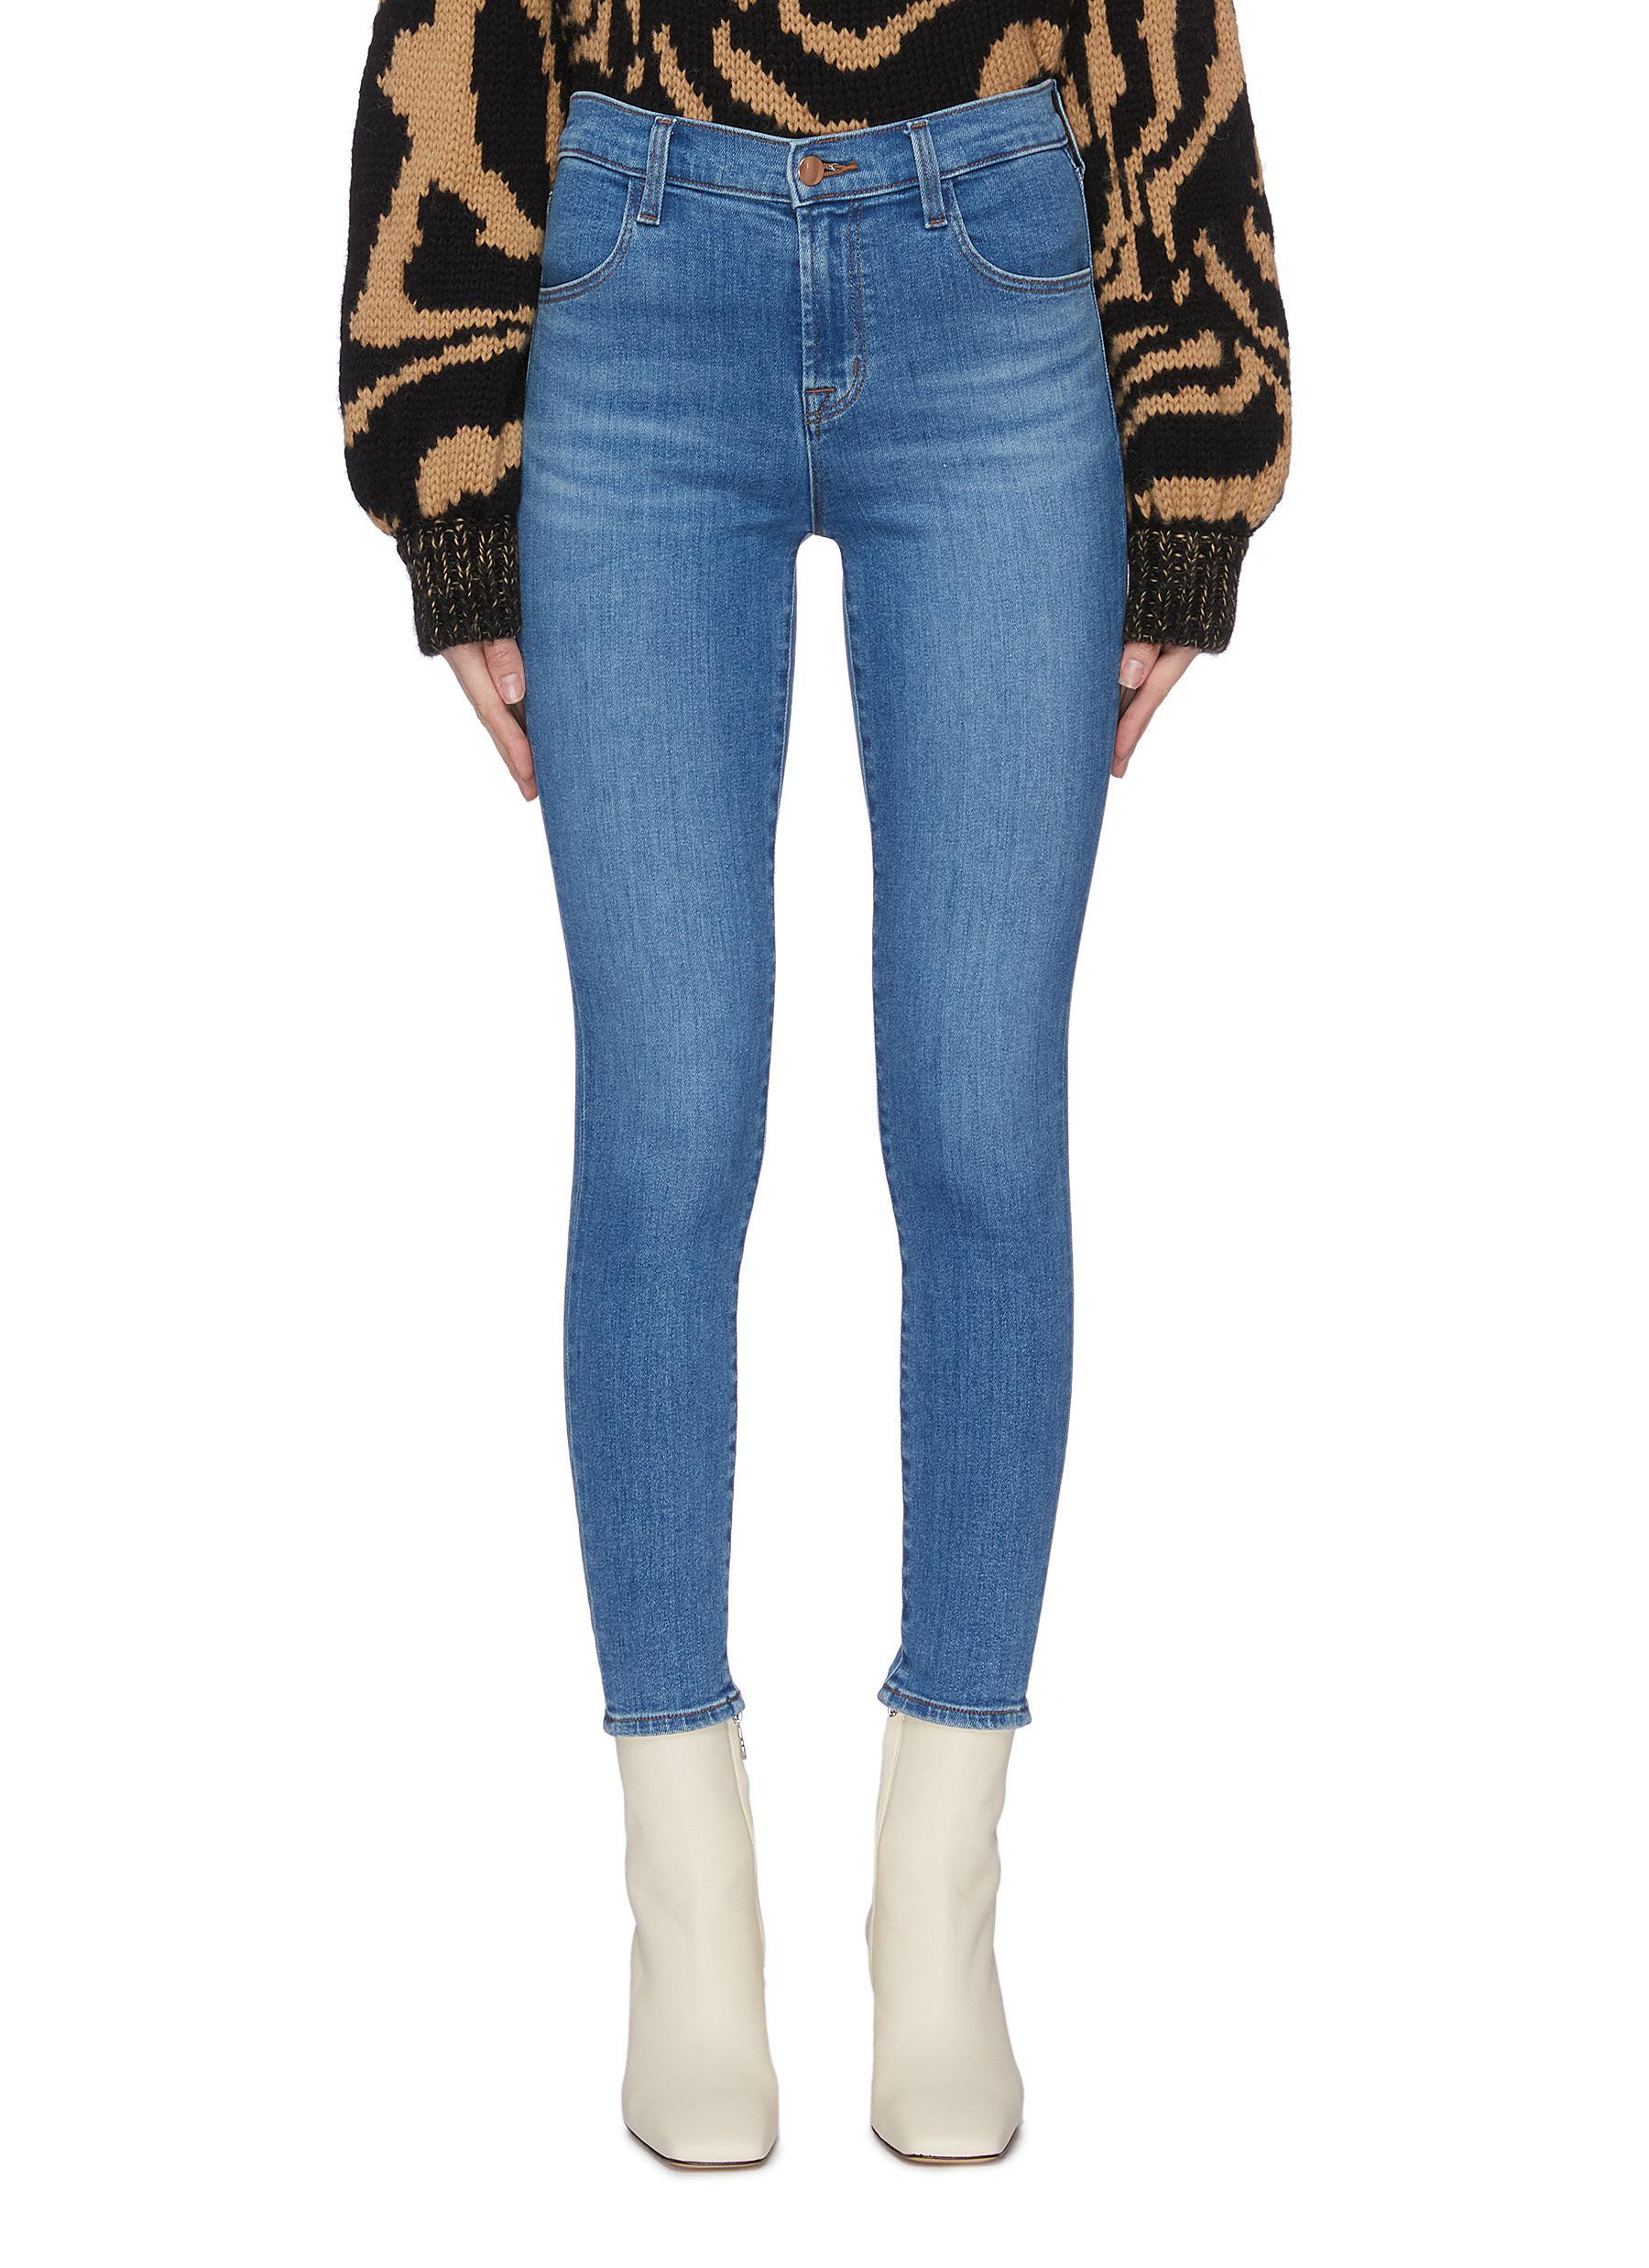 Buy J Brand Jeans 'Alana' whiskering crop skinny jeans